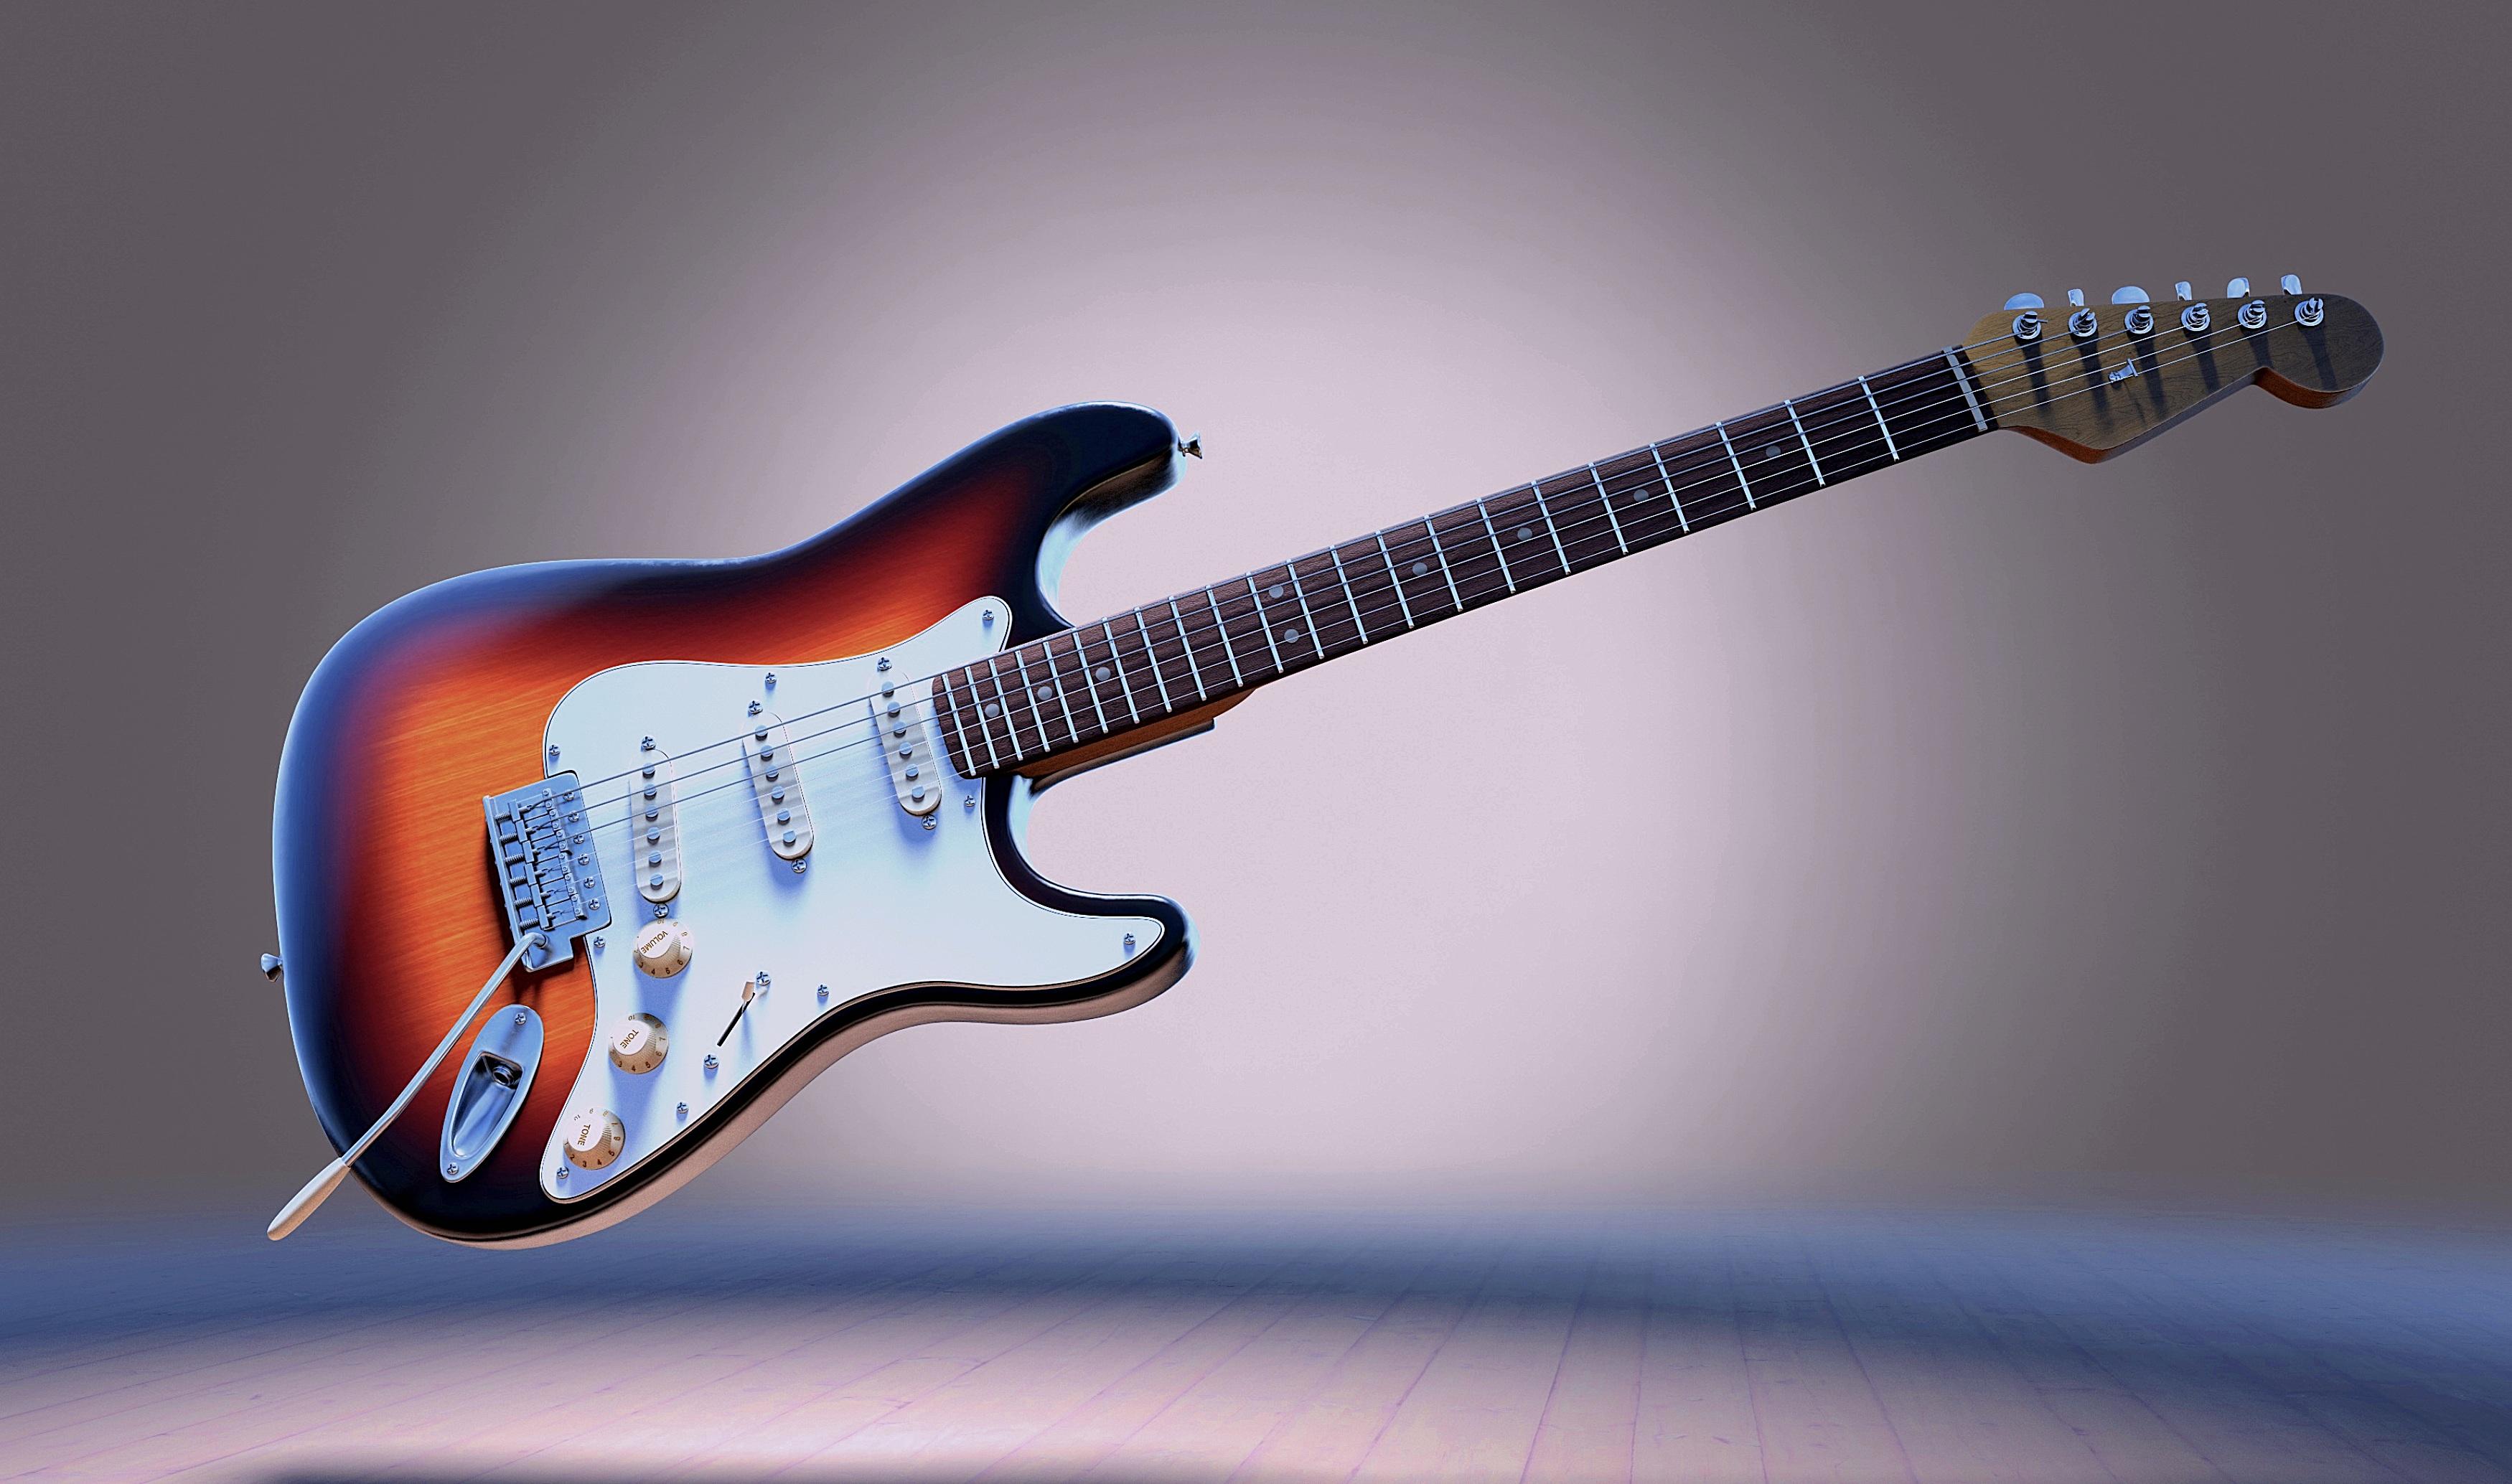 Electric Guitar Gibson Guitar Instrument 3500x2068